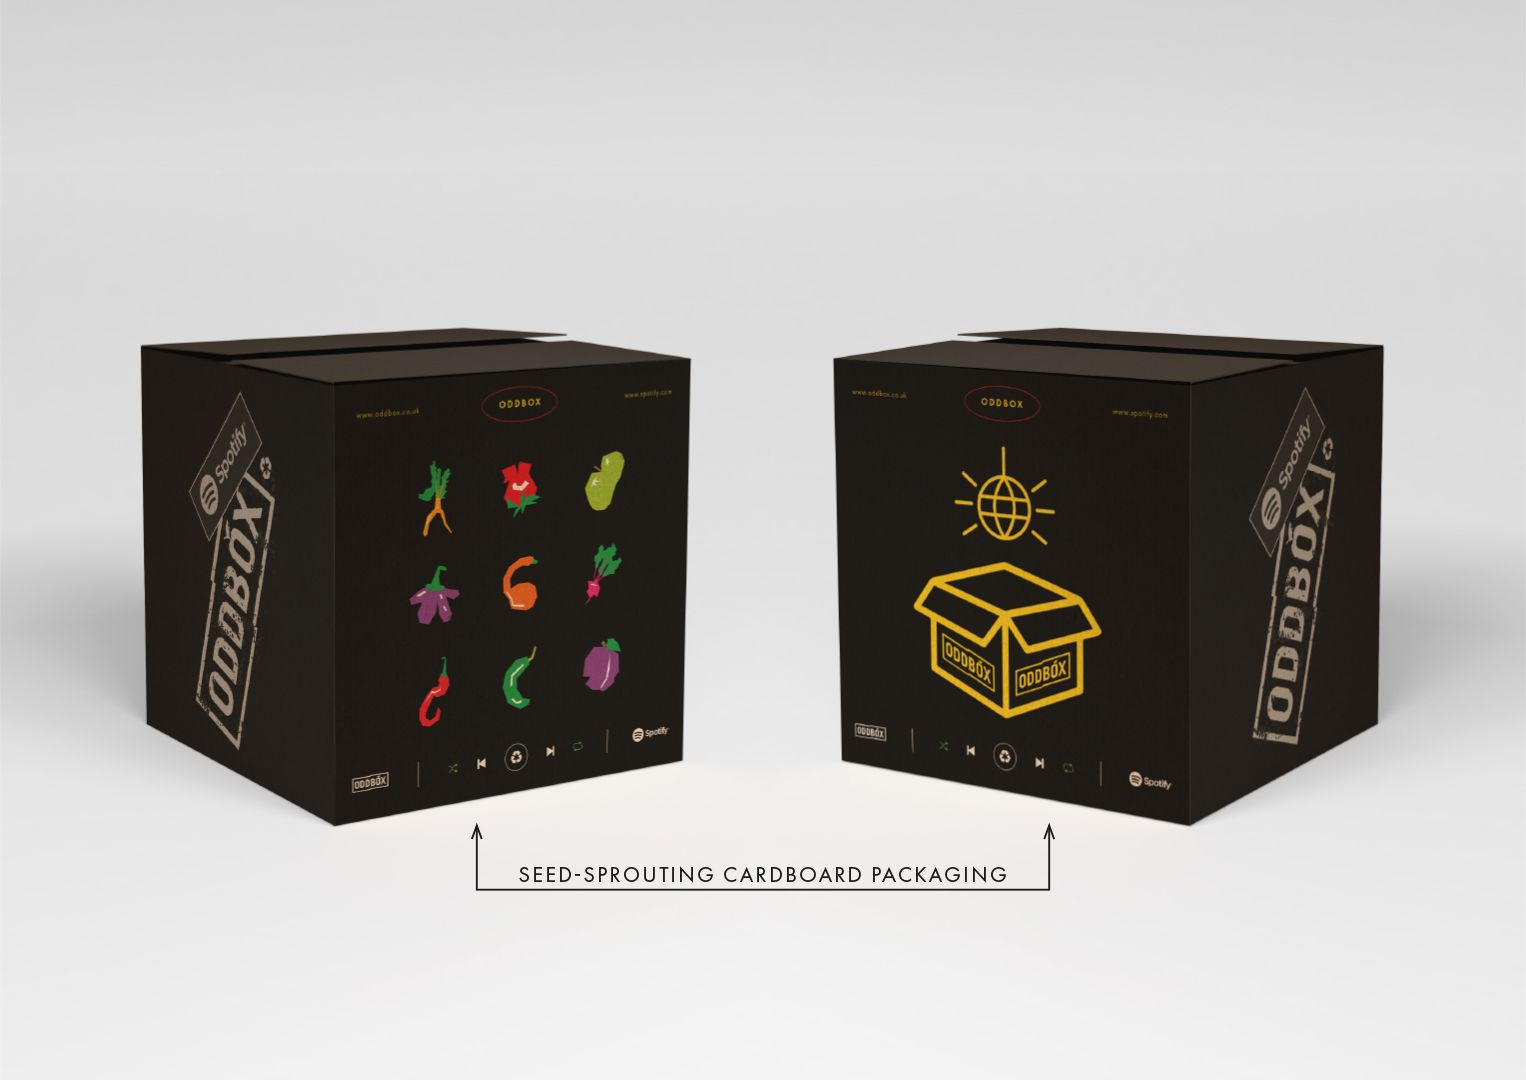 Oddbox Packaging